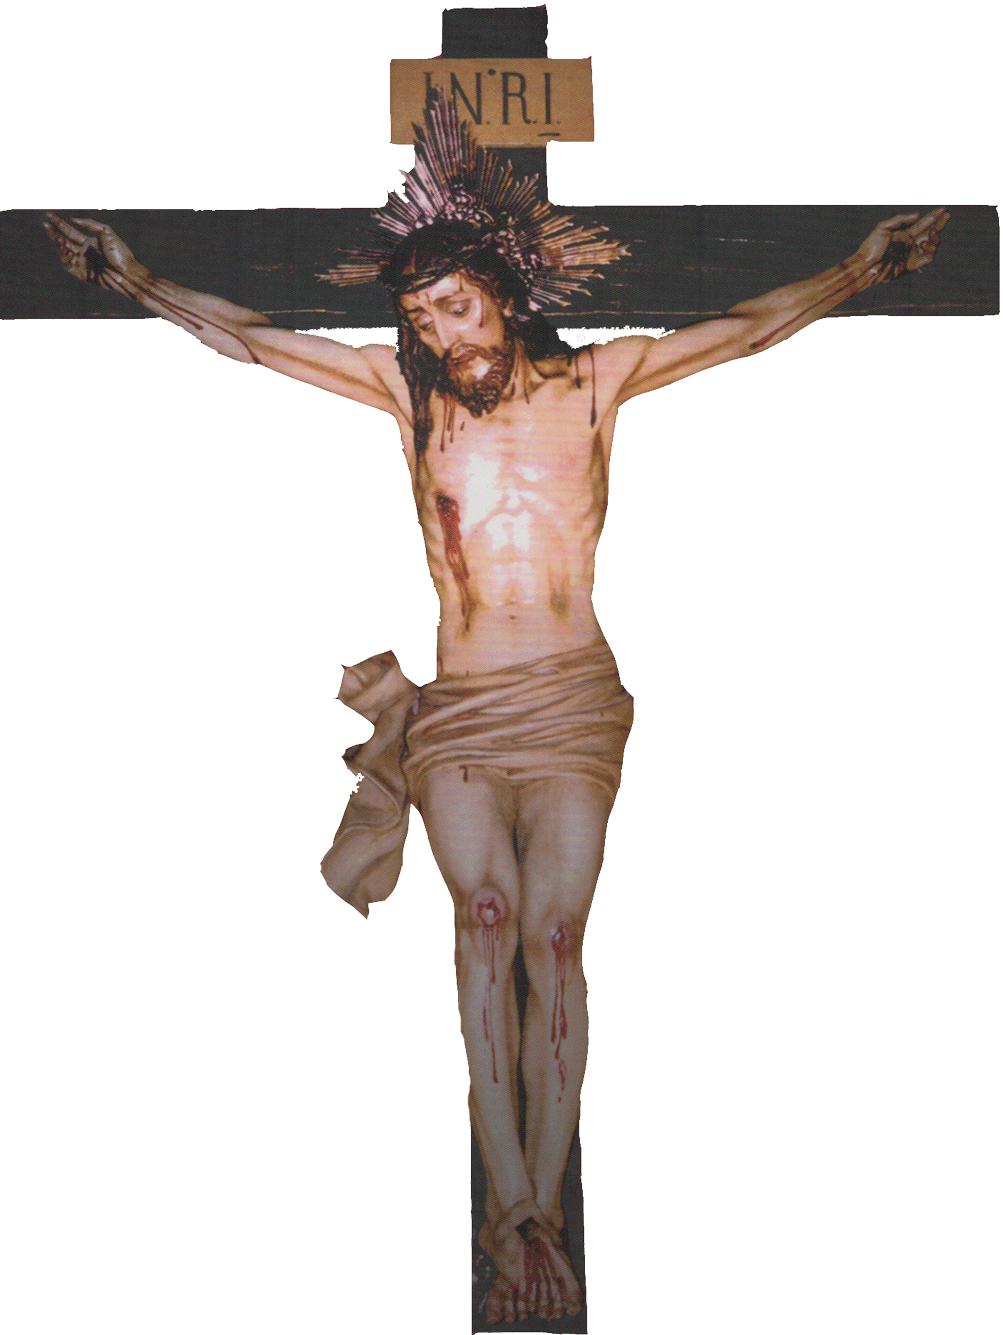 Crucifix clipart winter. Cruz png buscar con